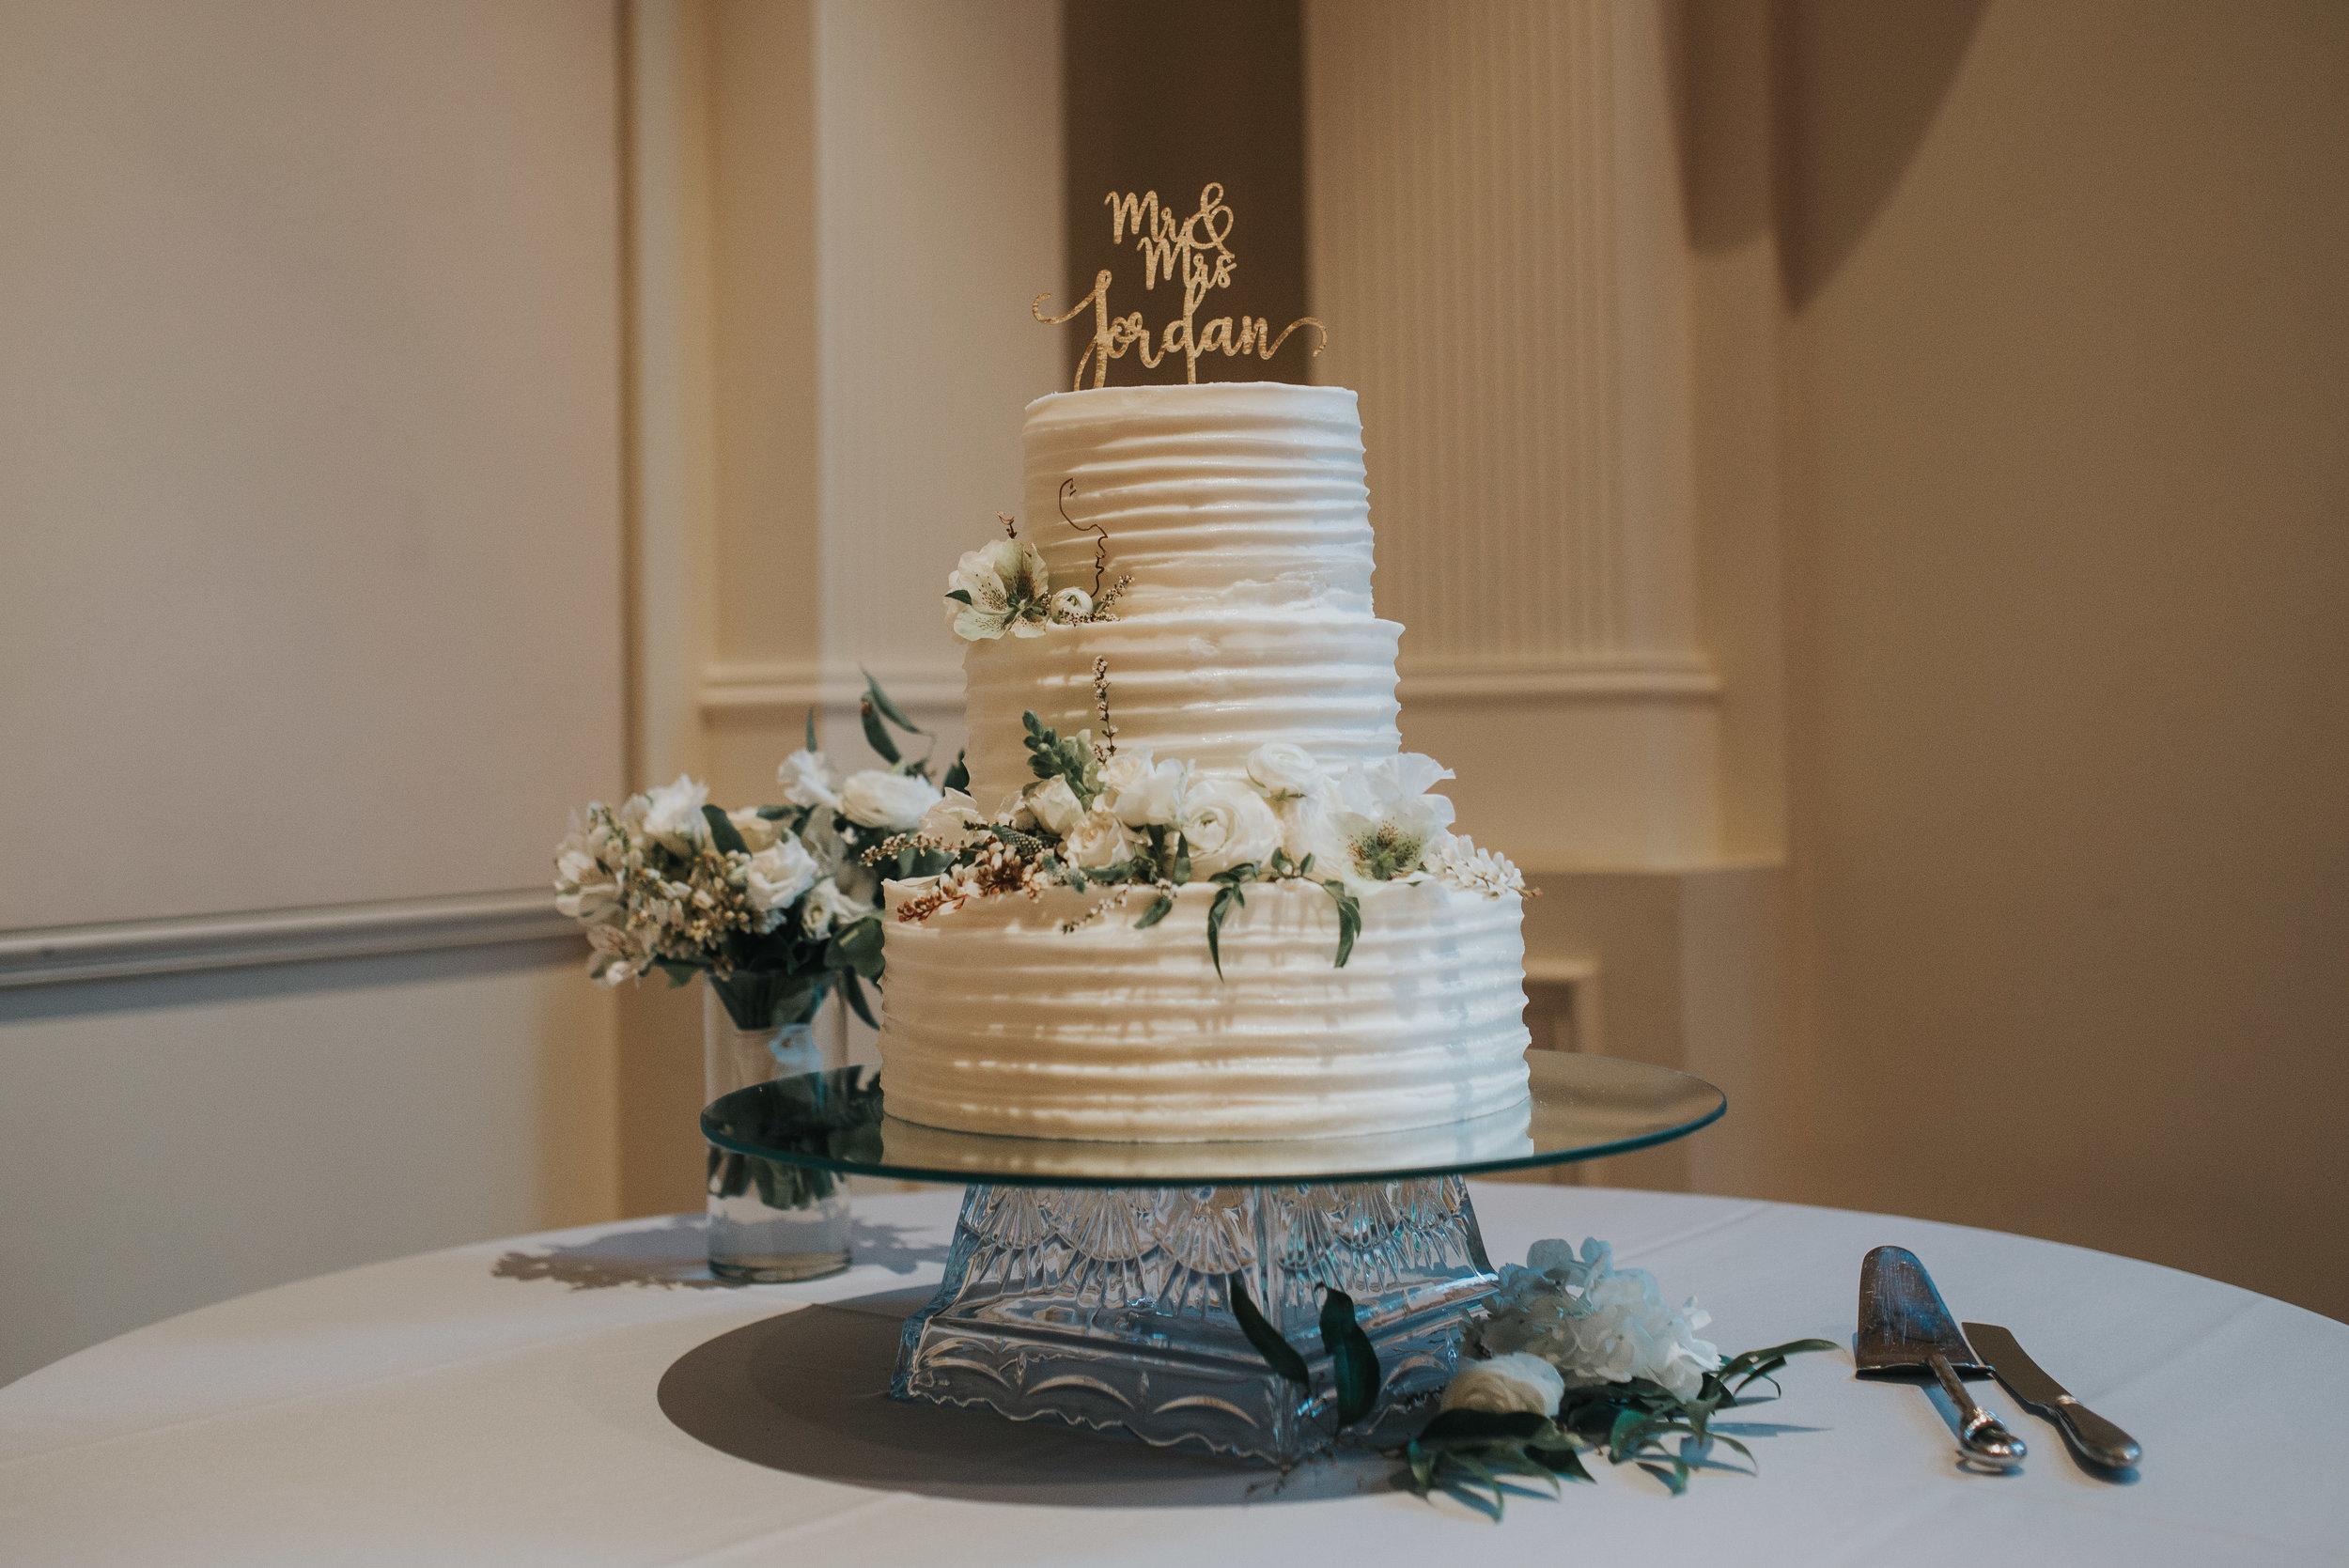 Wedding cake with eucalyptus accents